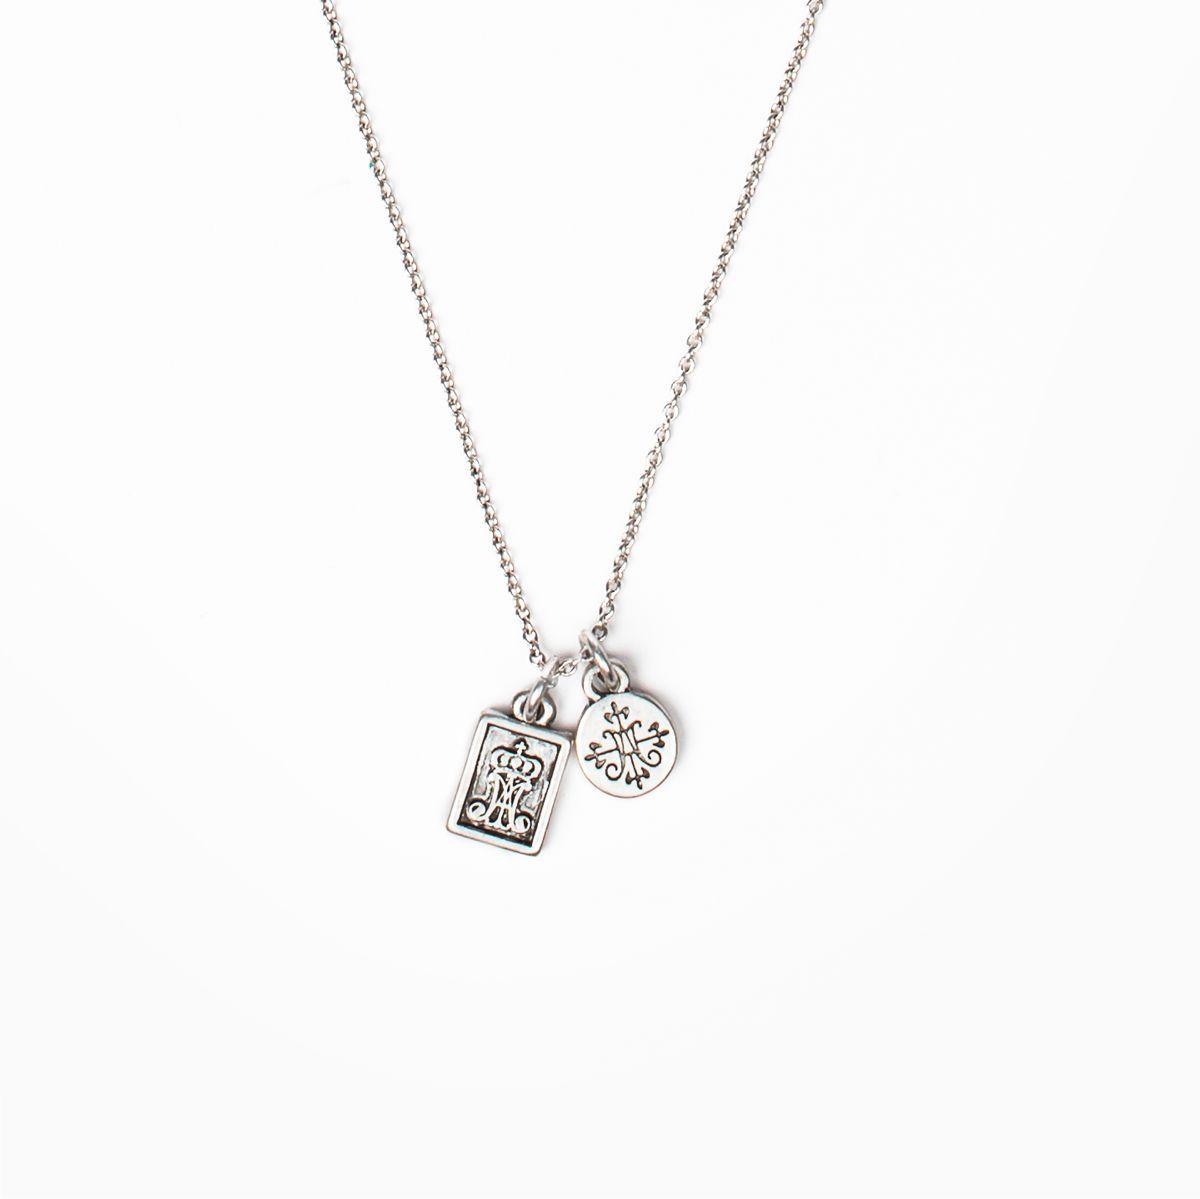 Garment Of Grace Petite Scapular Necklace In 2020 Scapular Necklace Scapular Necklace